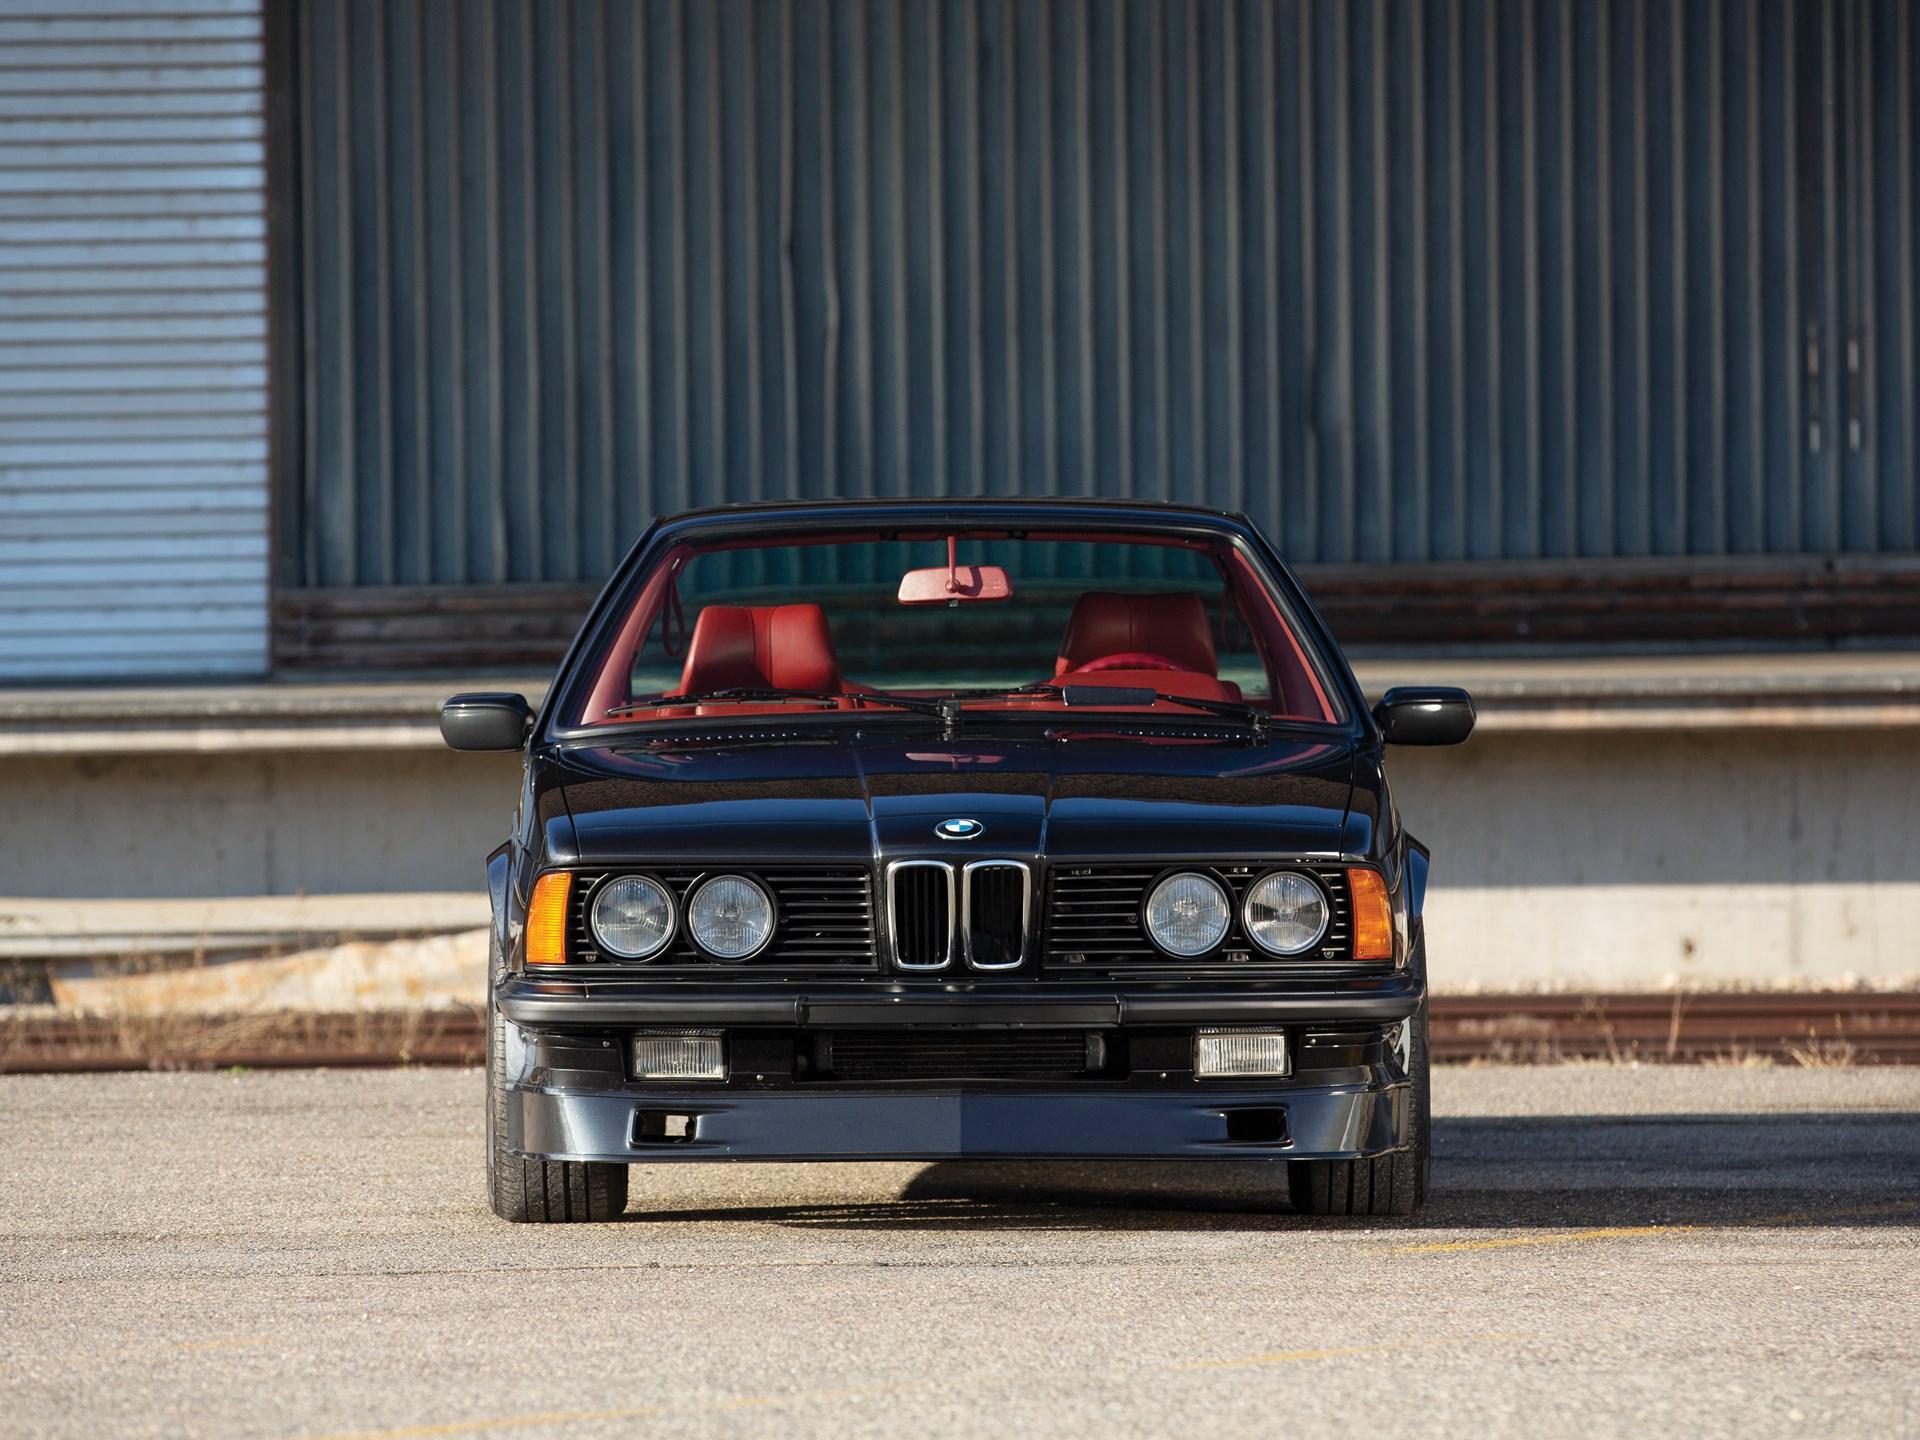 1987 BMW Alpina B7 Turbo Coupé/3